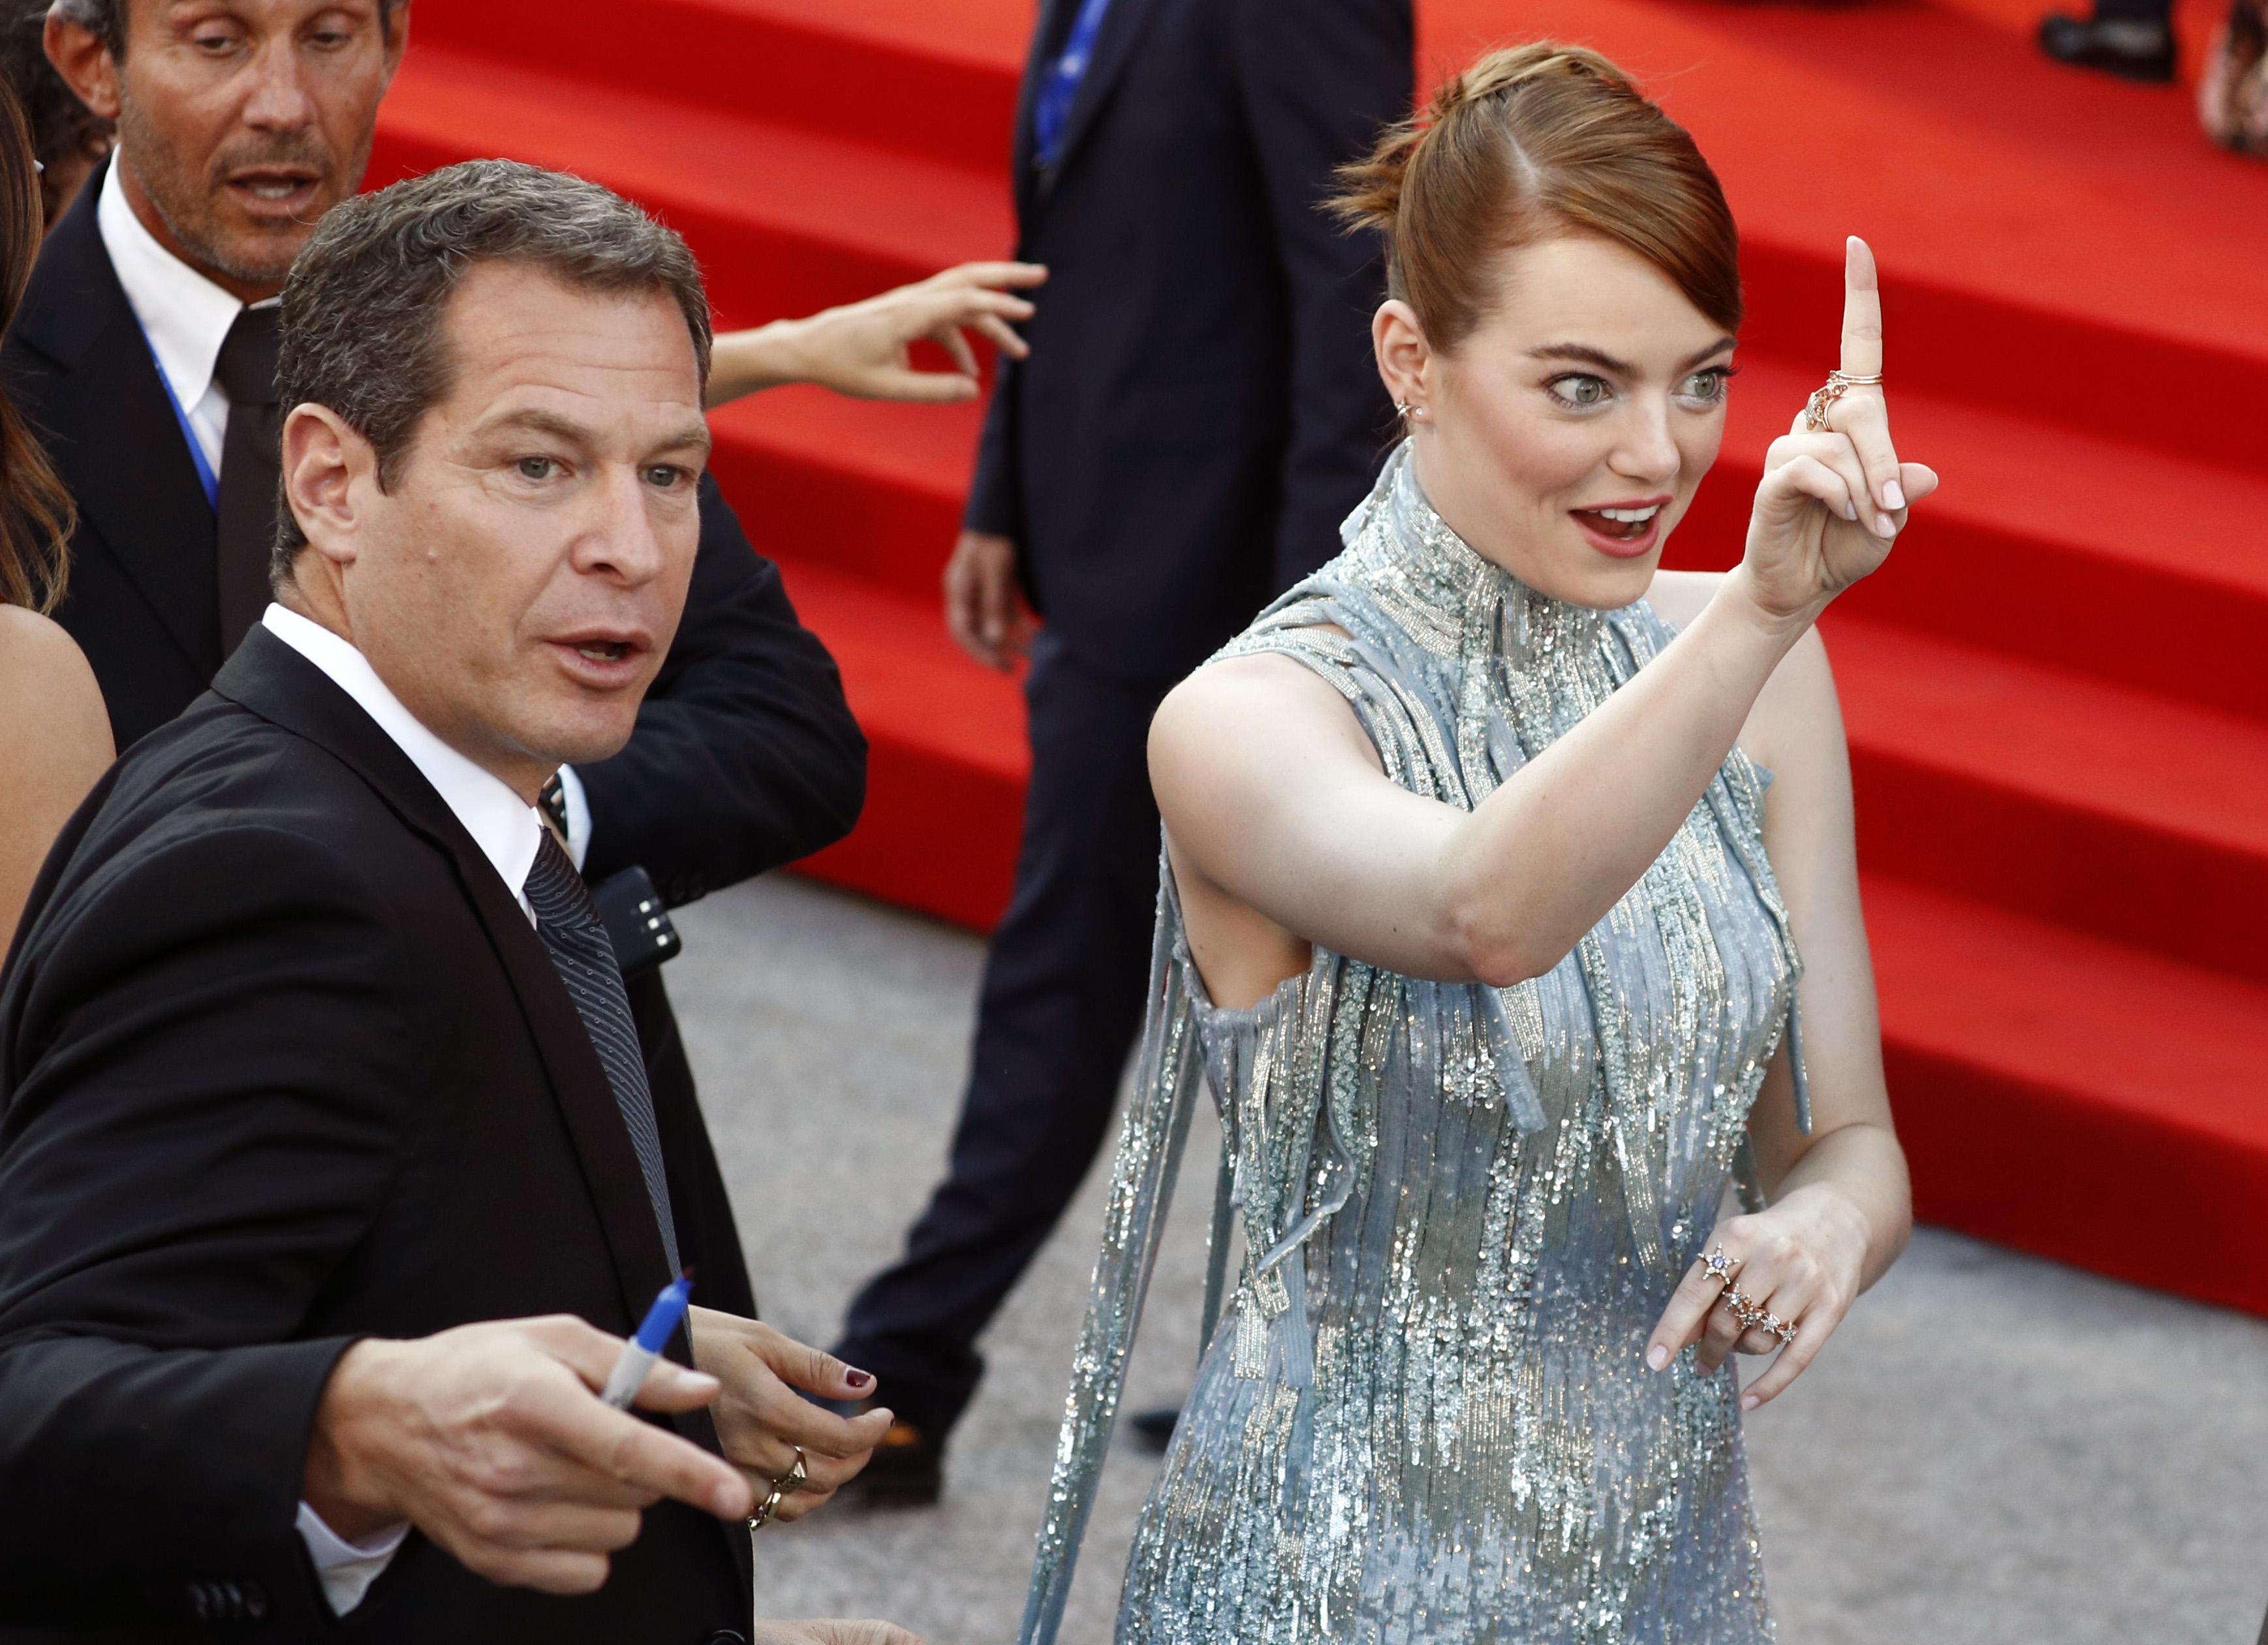 Эмма Стоун на открытии Венецианского кинофестиваля